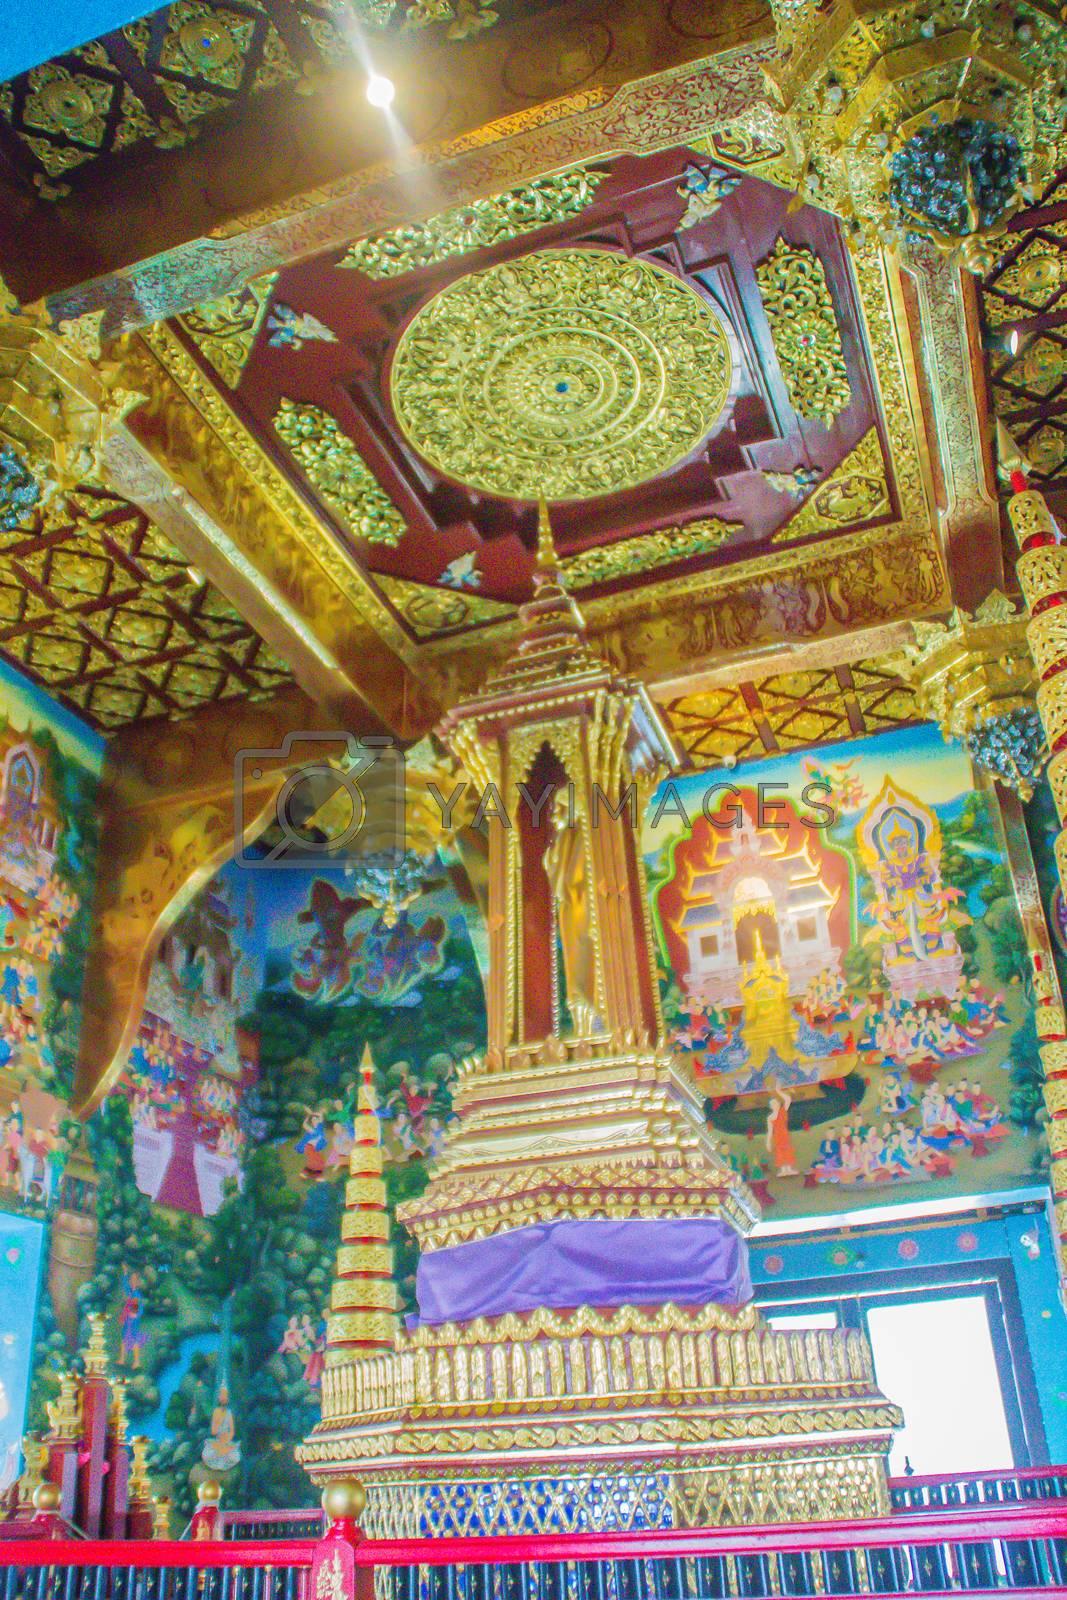 Beautiful interior inside the Chiang Mai City Pillar or Sao Inthakhin located at Wat Chedi Luang in Chiang Mai, Thailand.